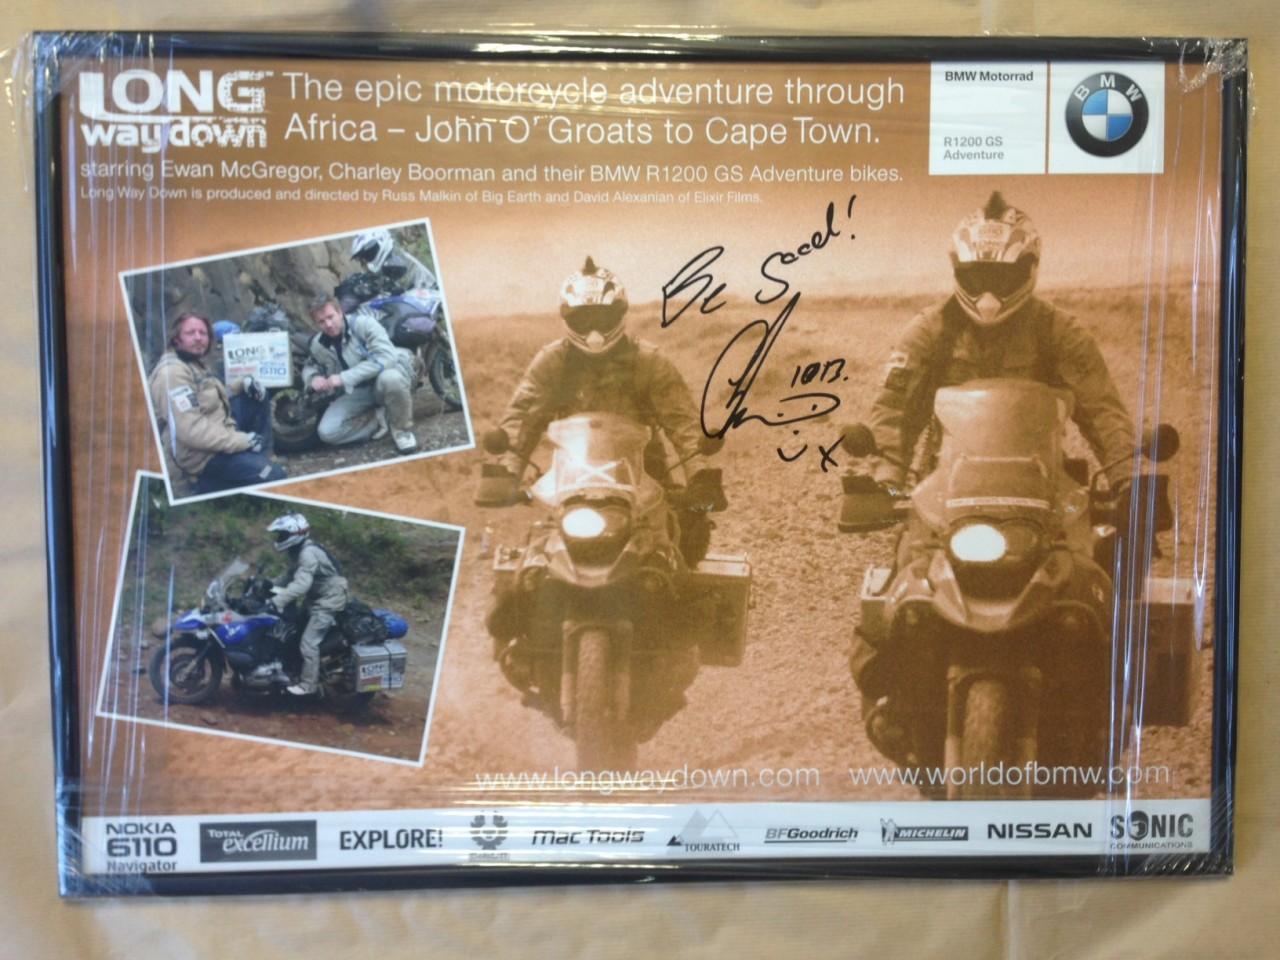 Signed framed poster